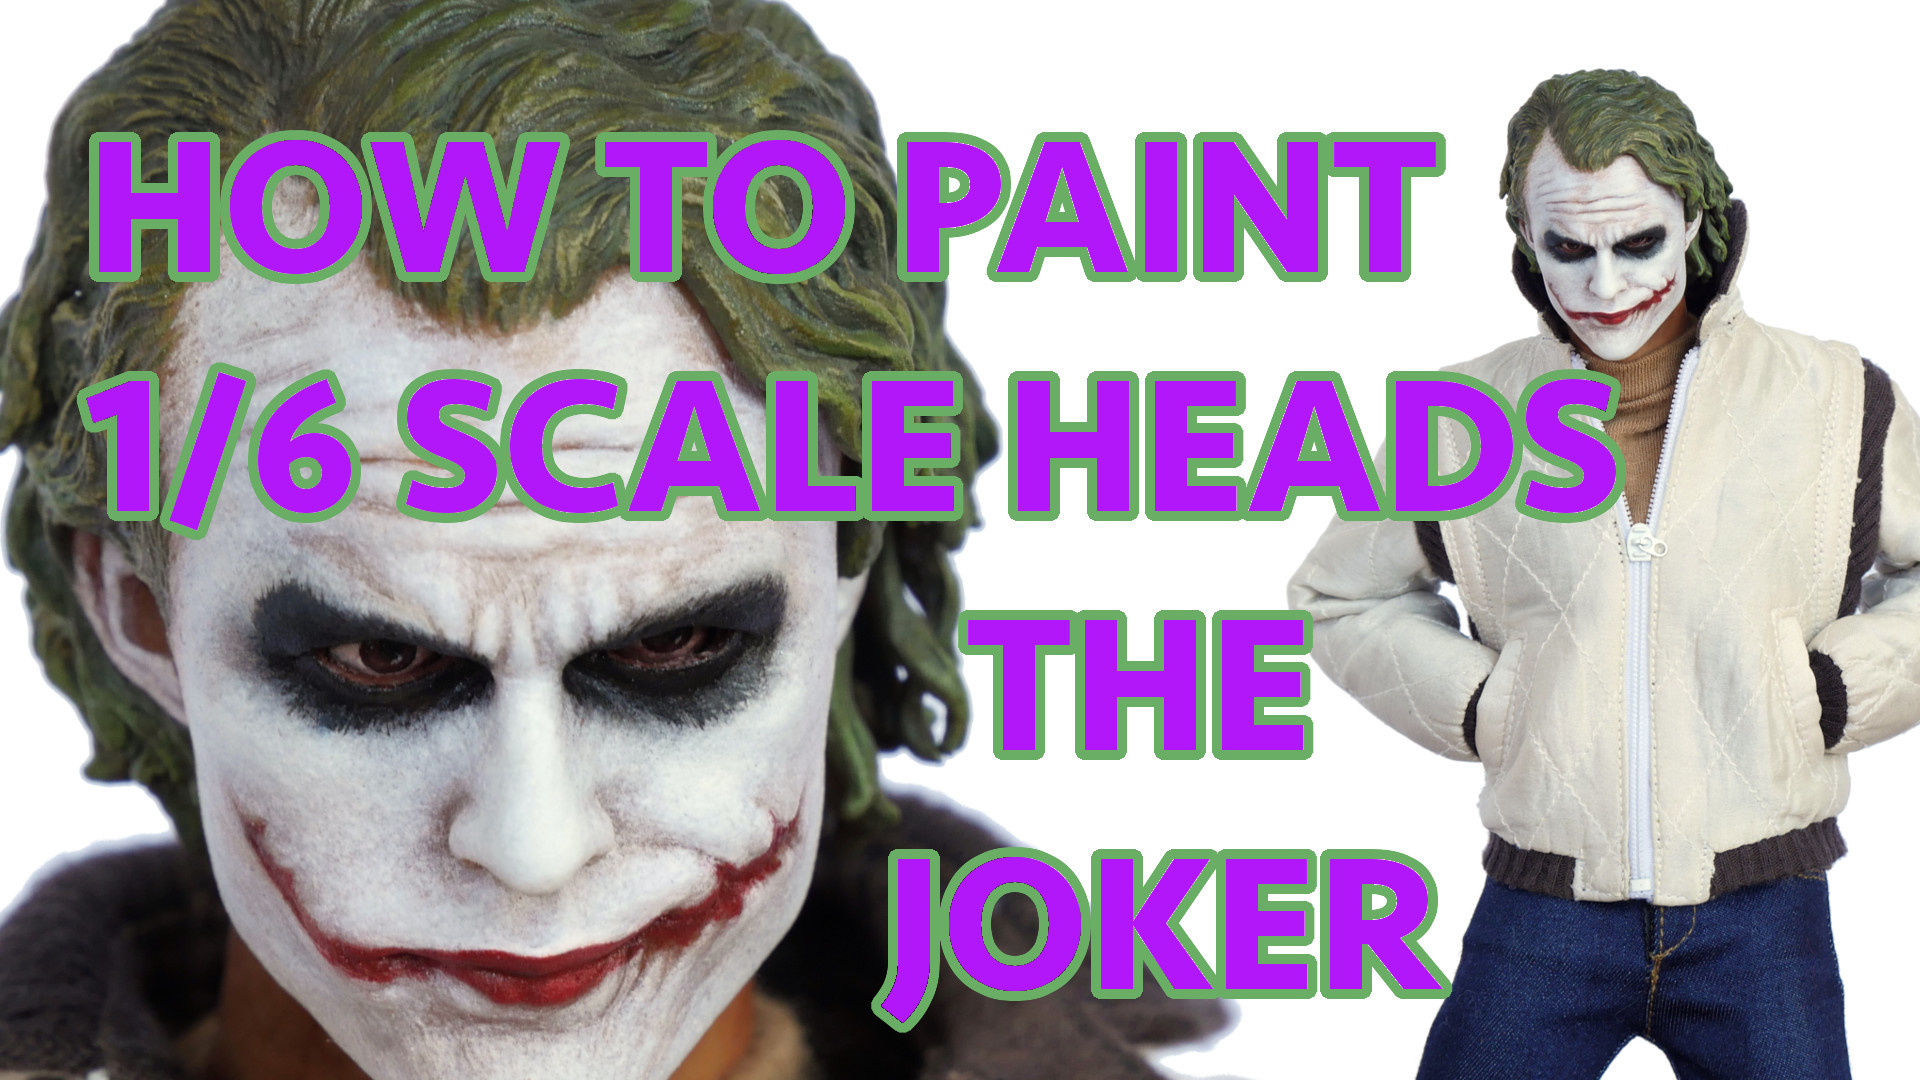 Michael enea jokerheader